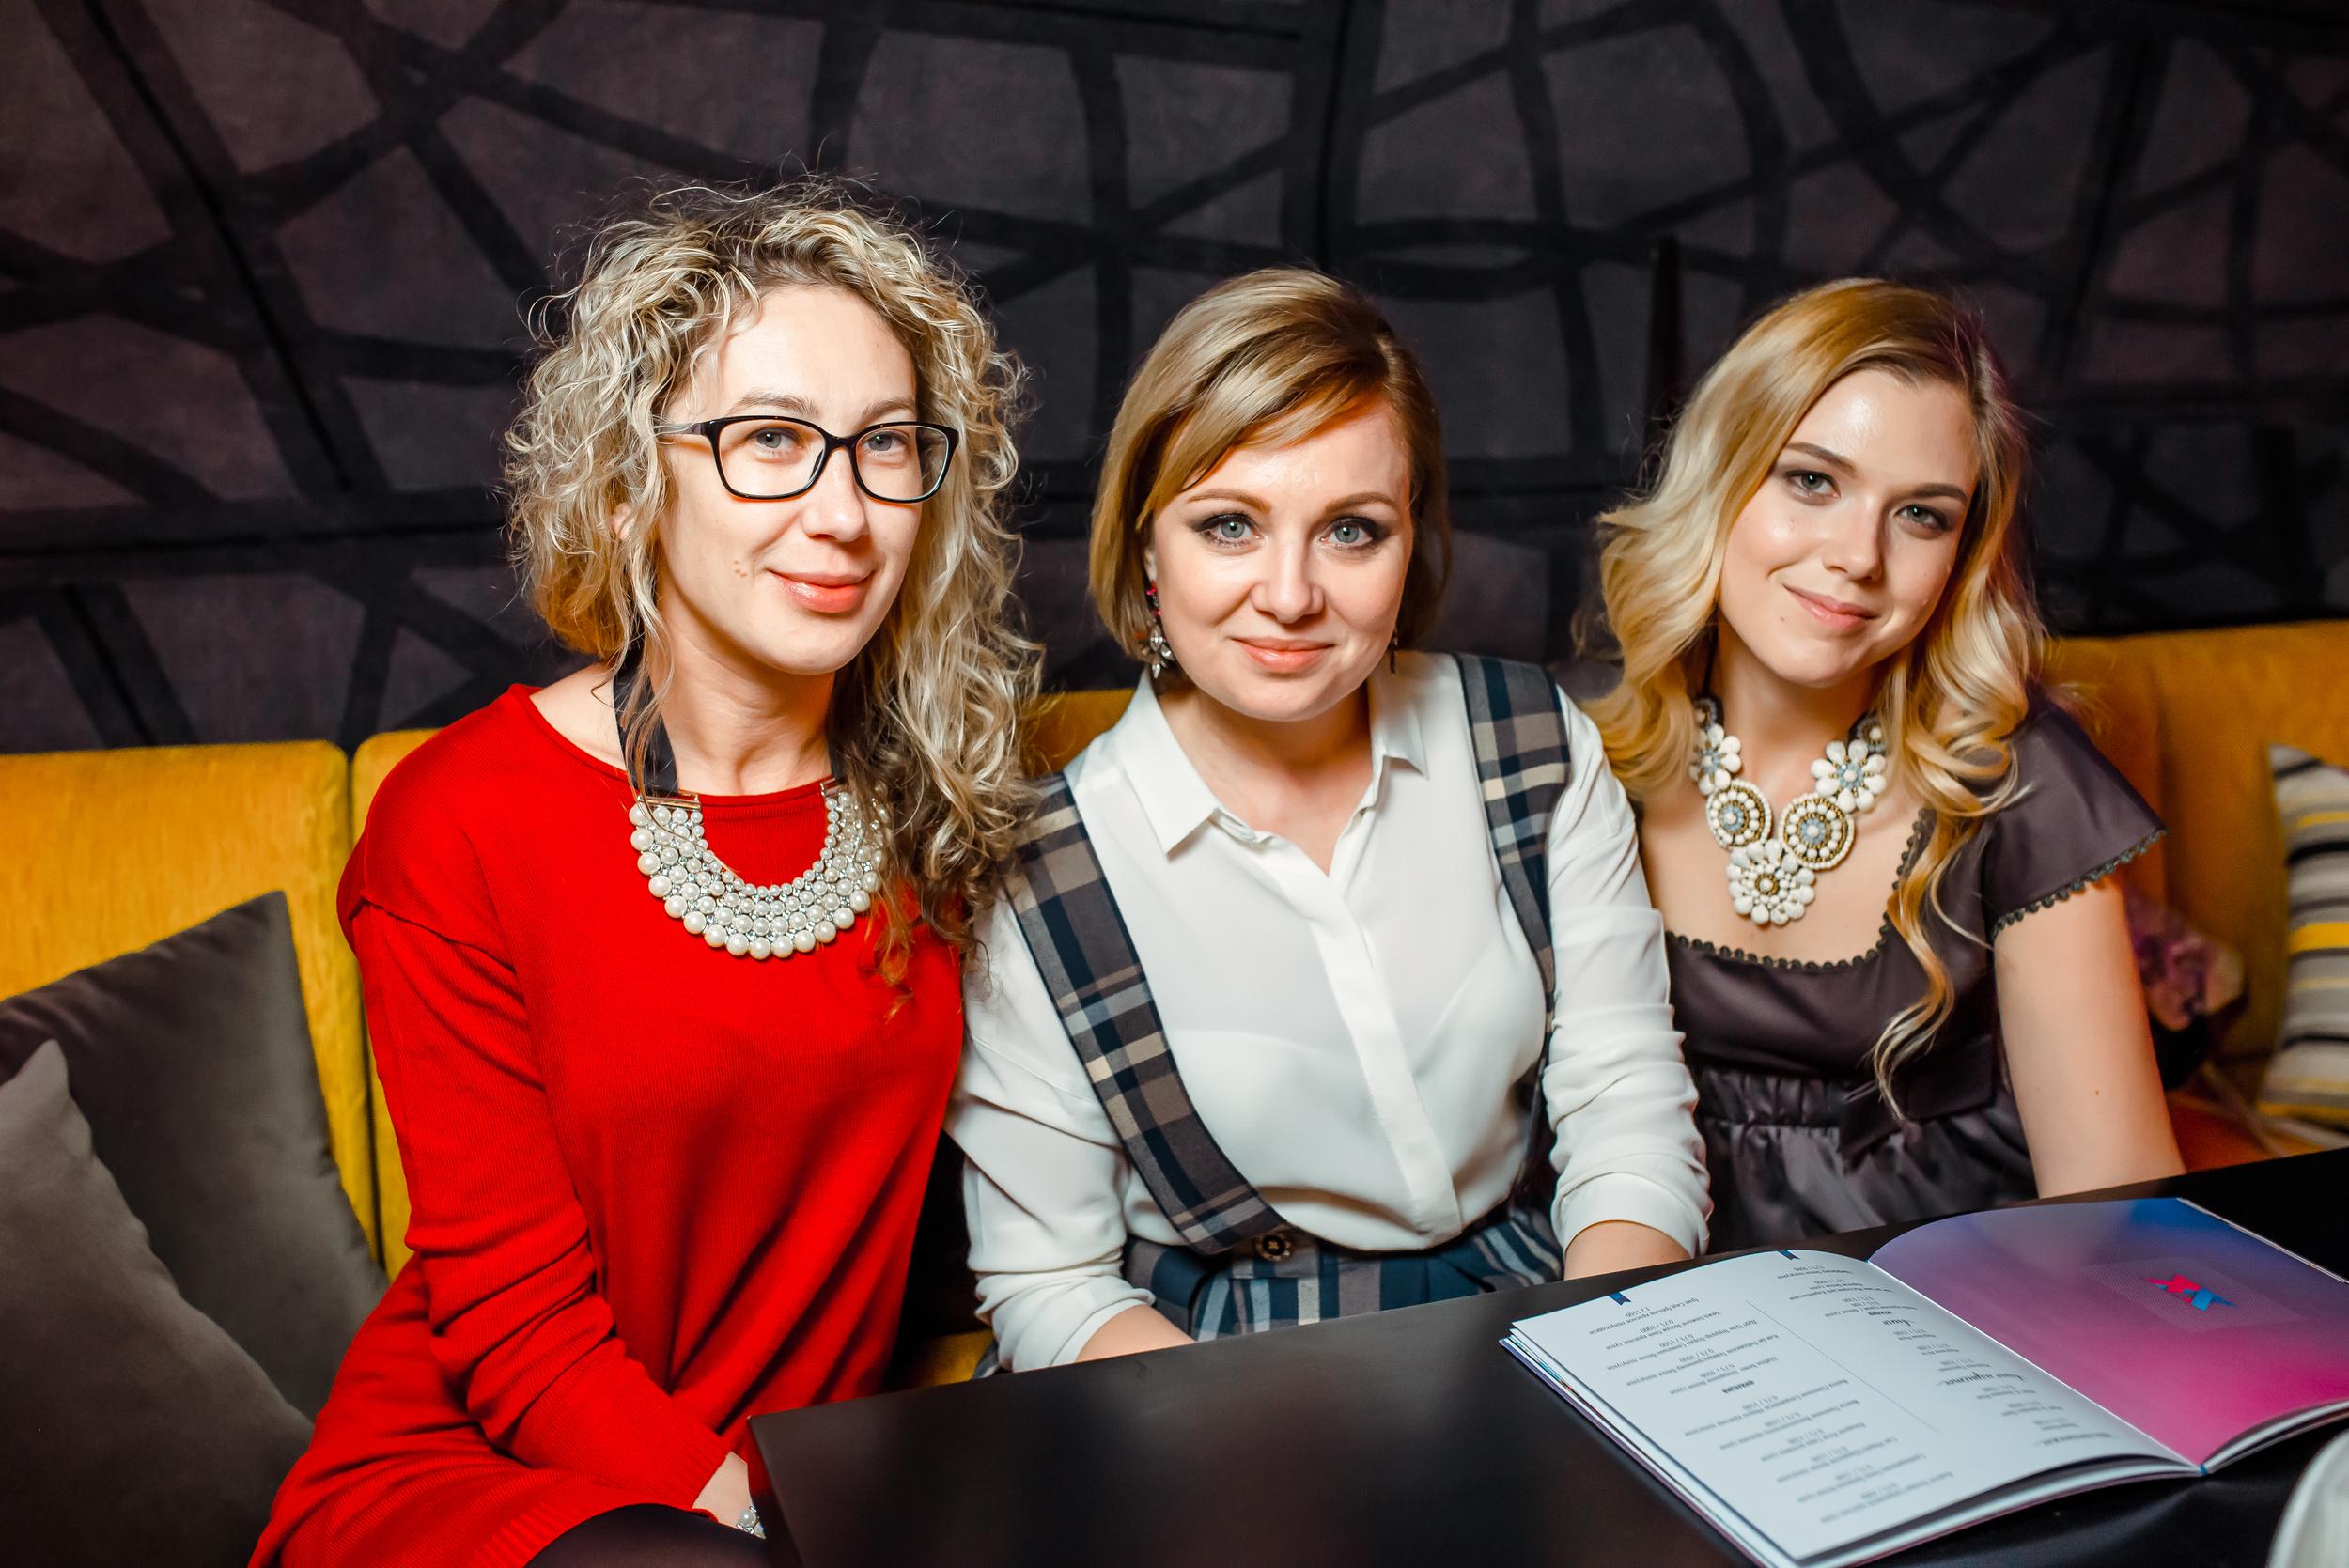 010_2015-02-26_21-31-03_Kiseleva.jpg